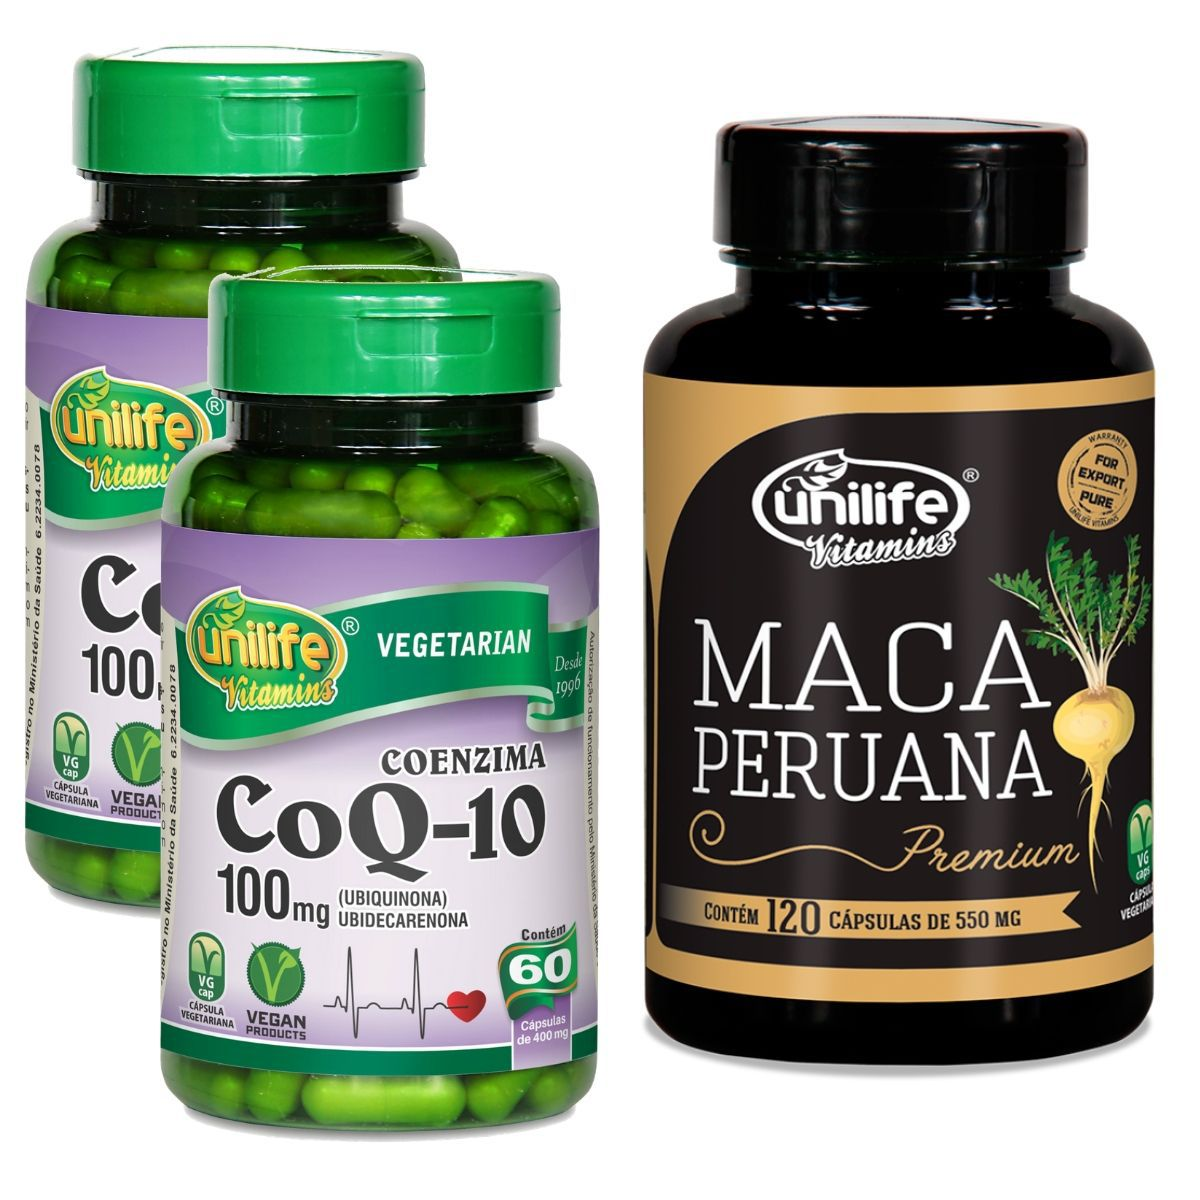 Kit 2 Coenzima Q10 60 Cáps + 1 Maca Peruana Premium 120 Cáps - Unilife